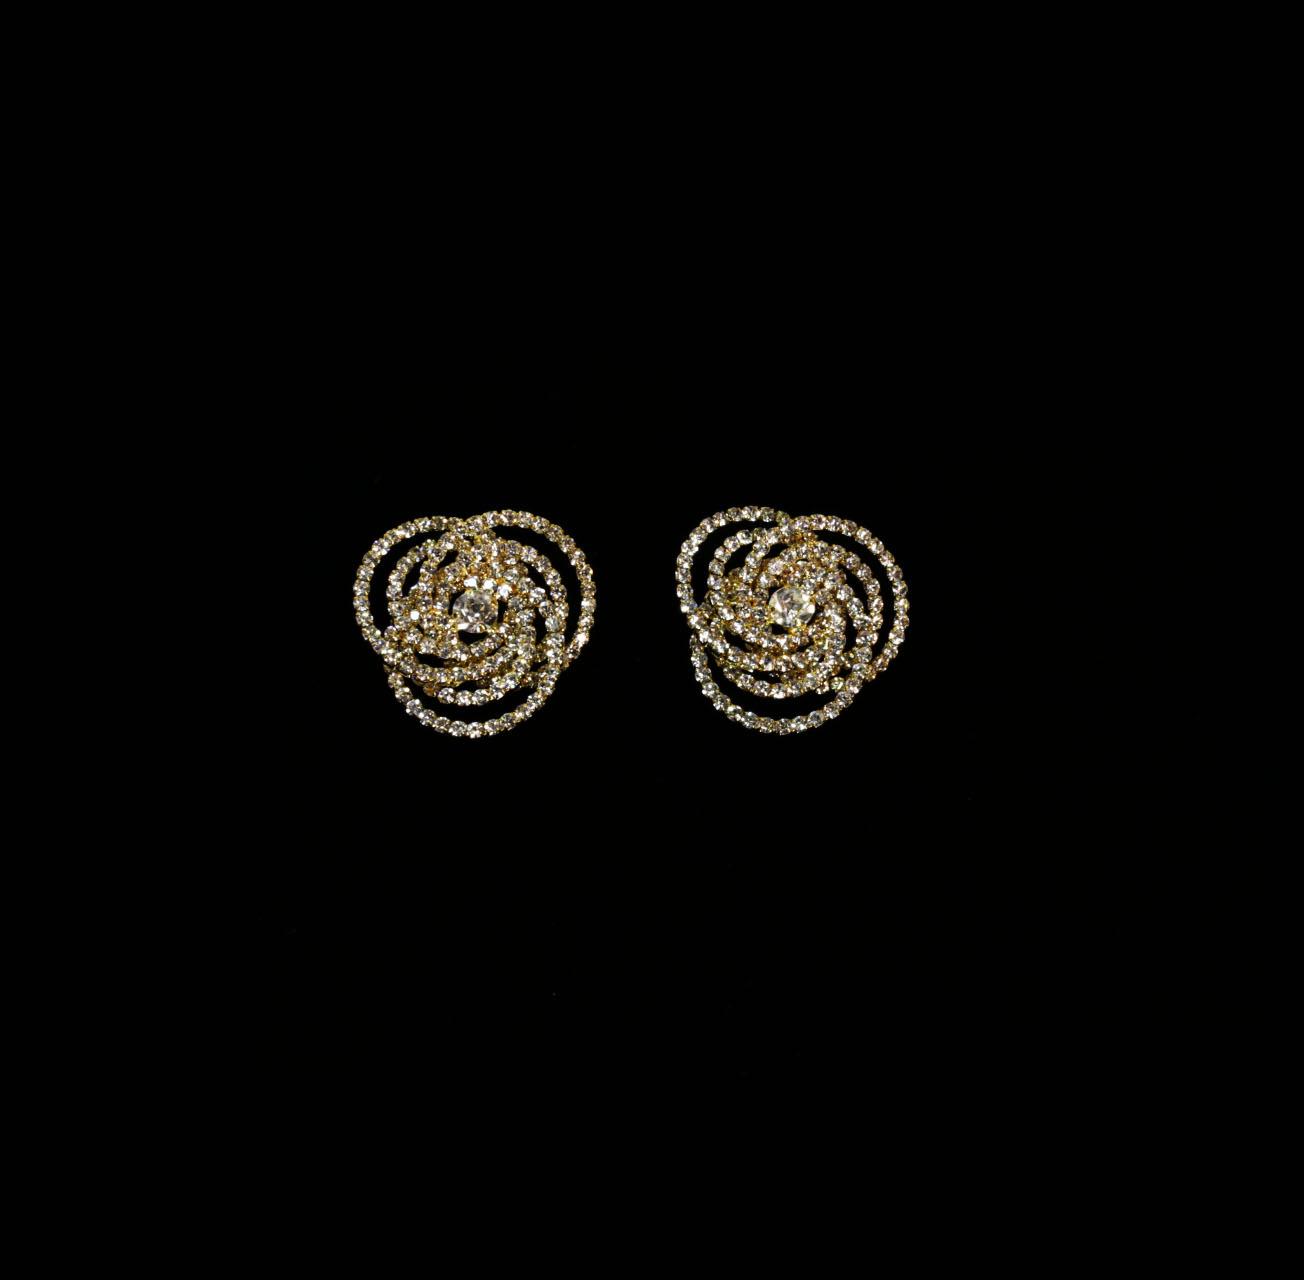 Beautiful Floral Gold Stud Earrings